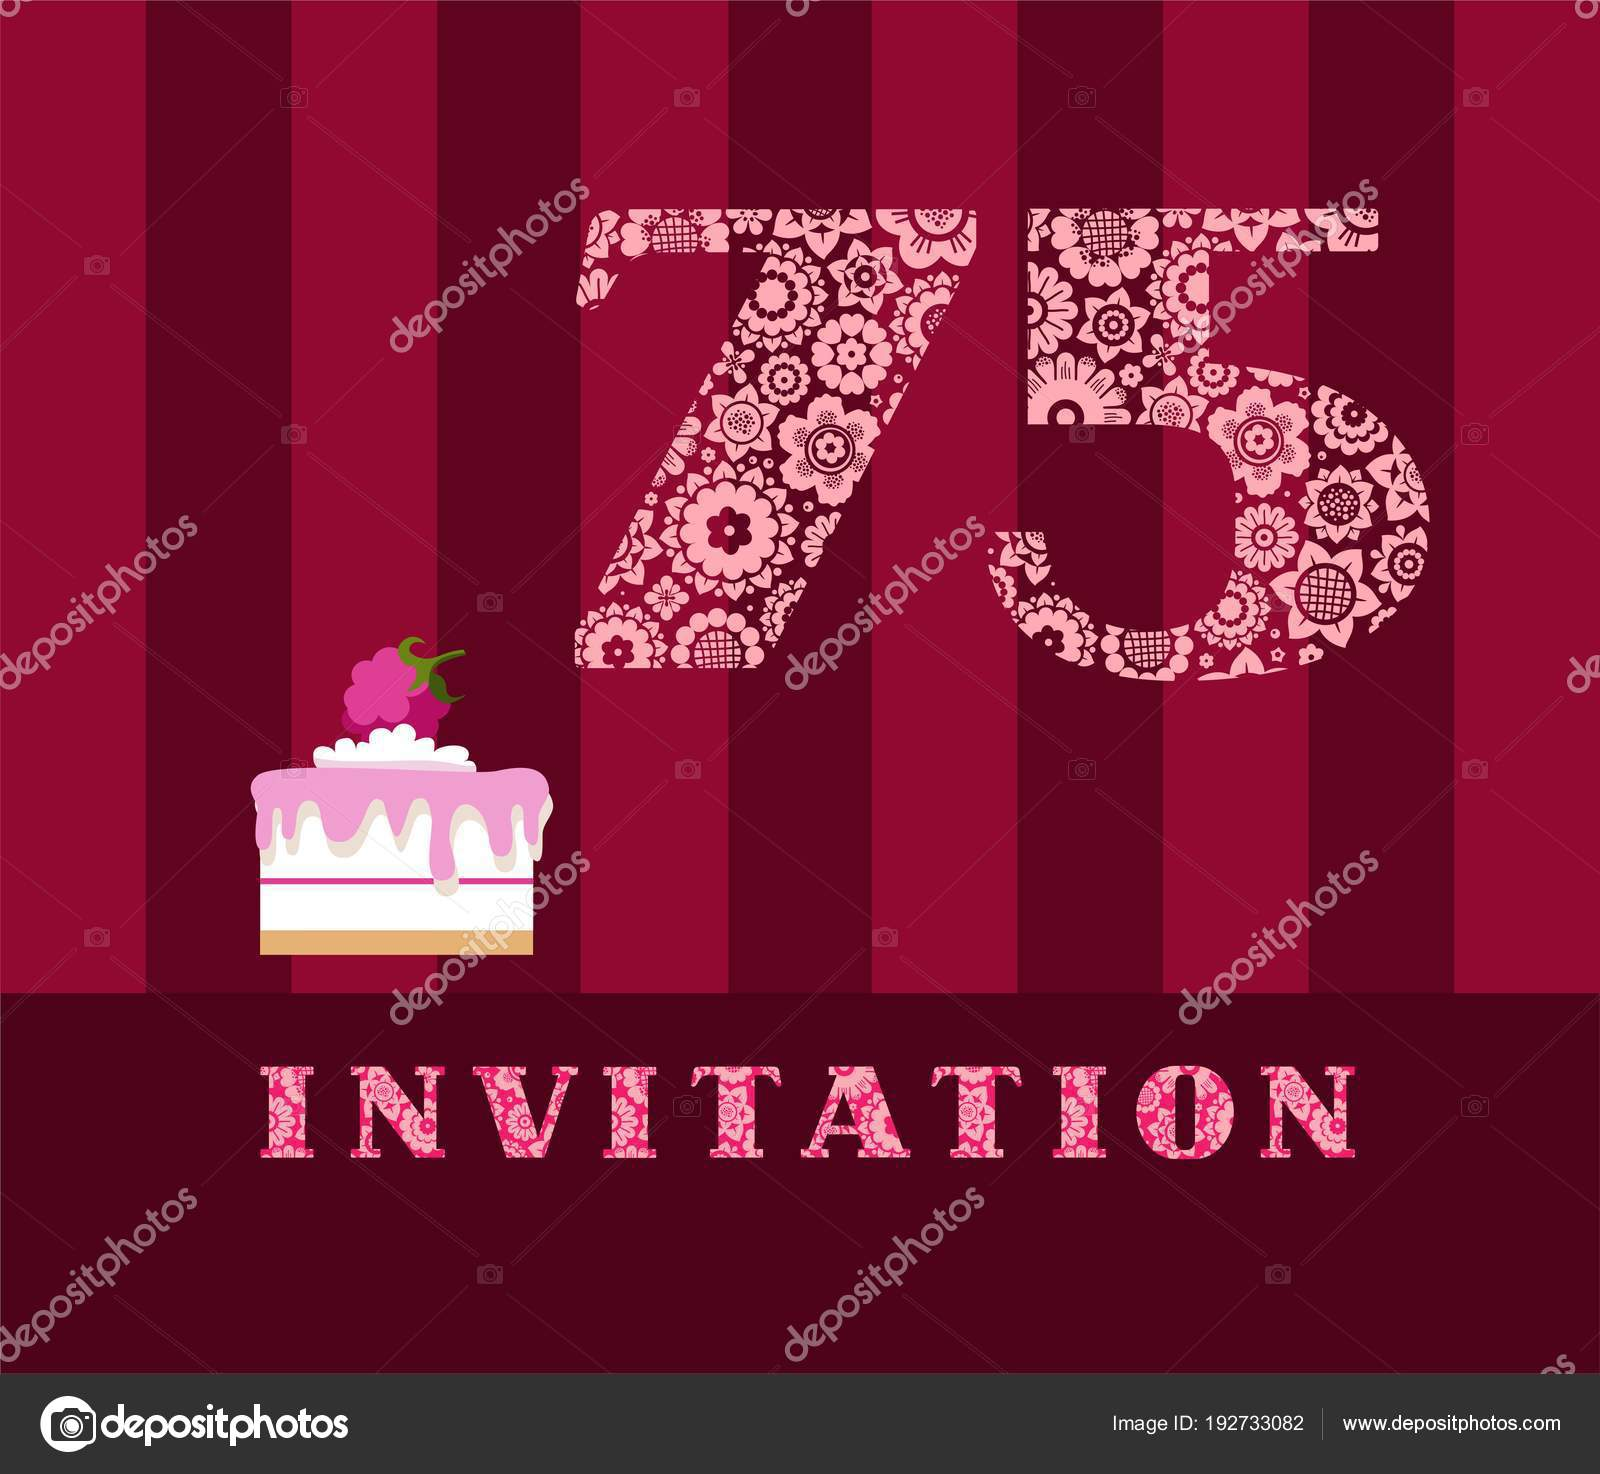 Invitation years old raspberry pie vector english invitation invitation years old raspberry pie vector english invitation birthday party stock vector stopboris Choice Image